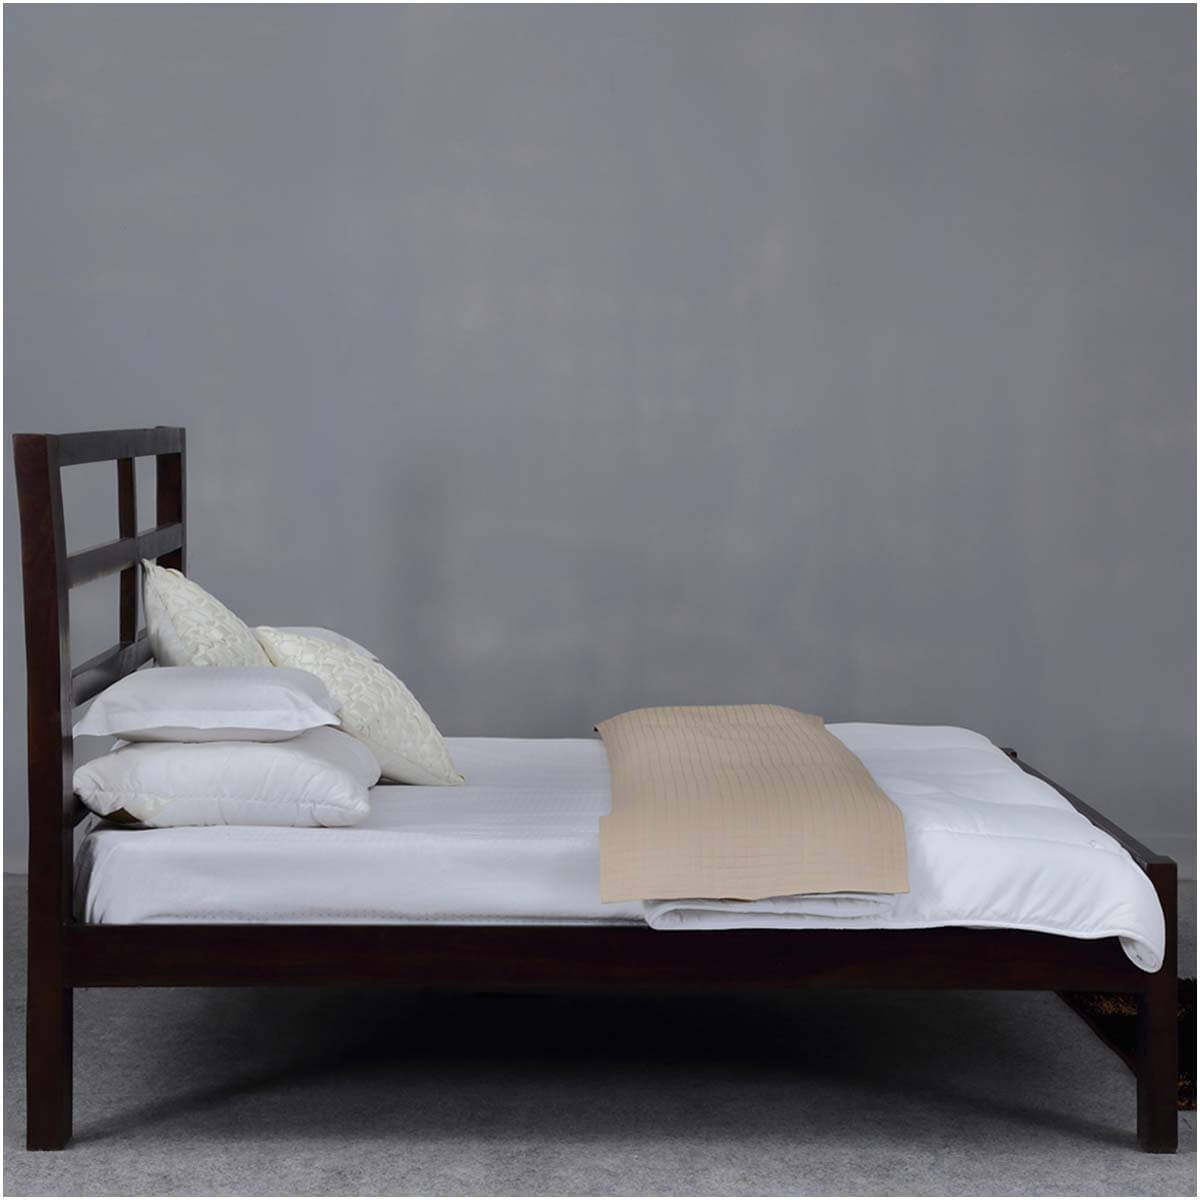 Modern Rustic Open Design Solid Wood Platform Bed w Headboard